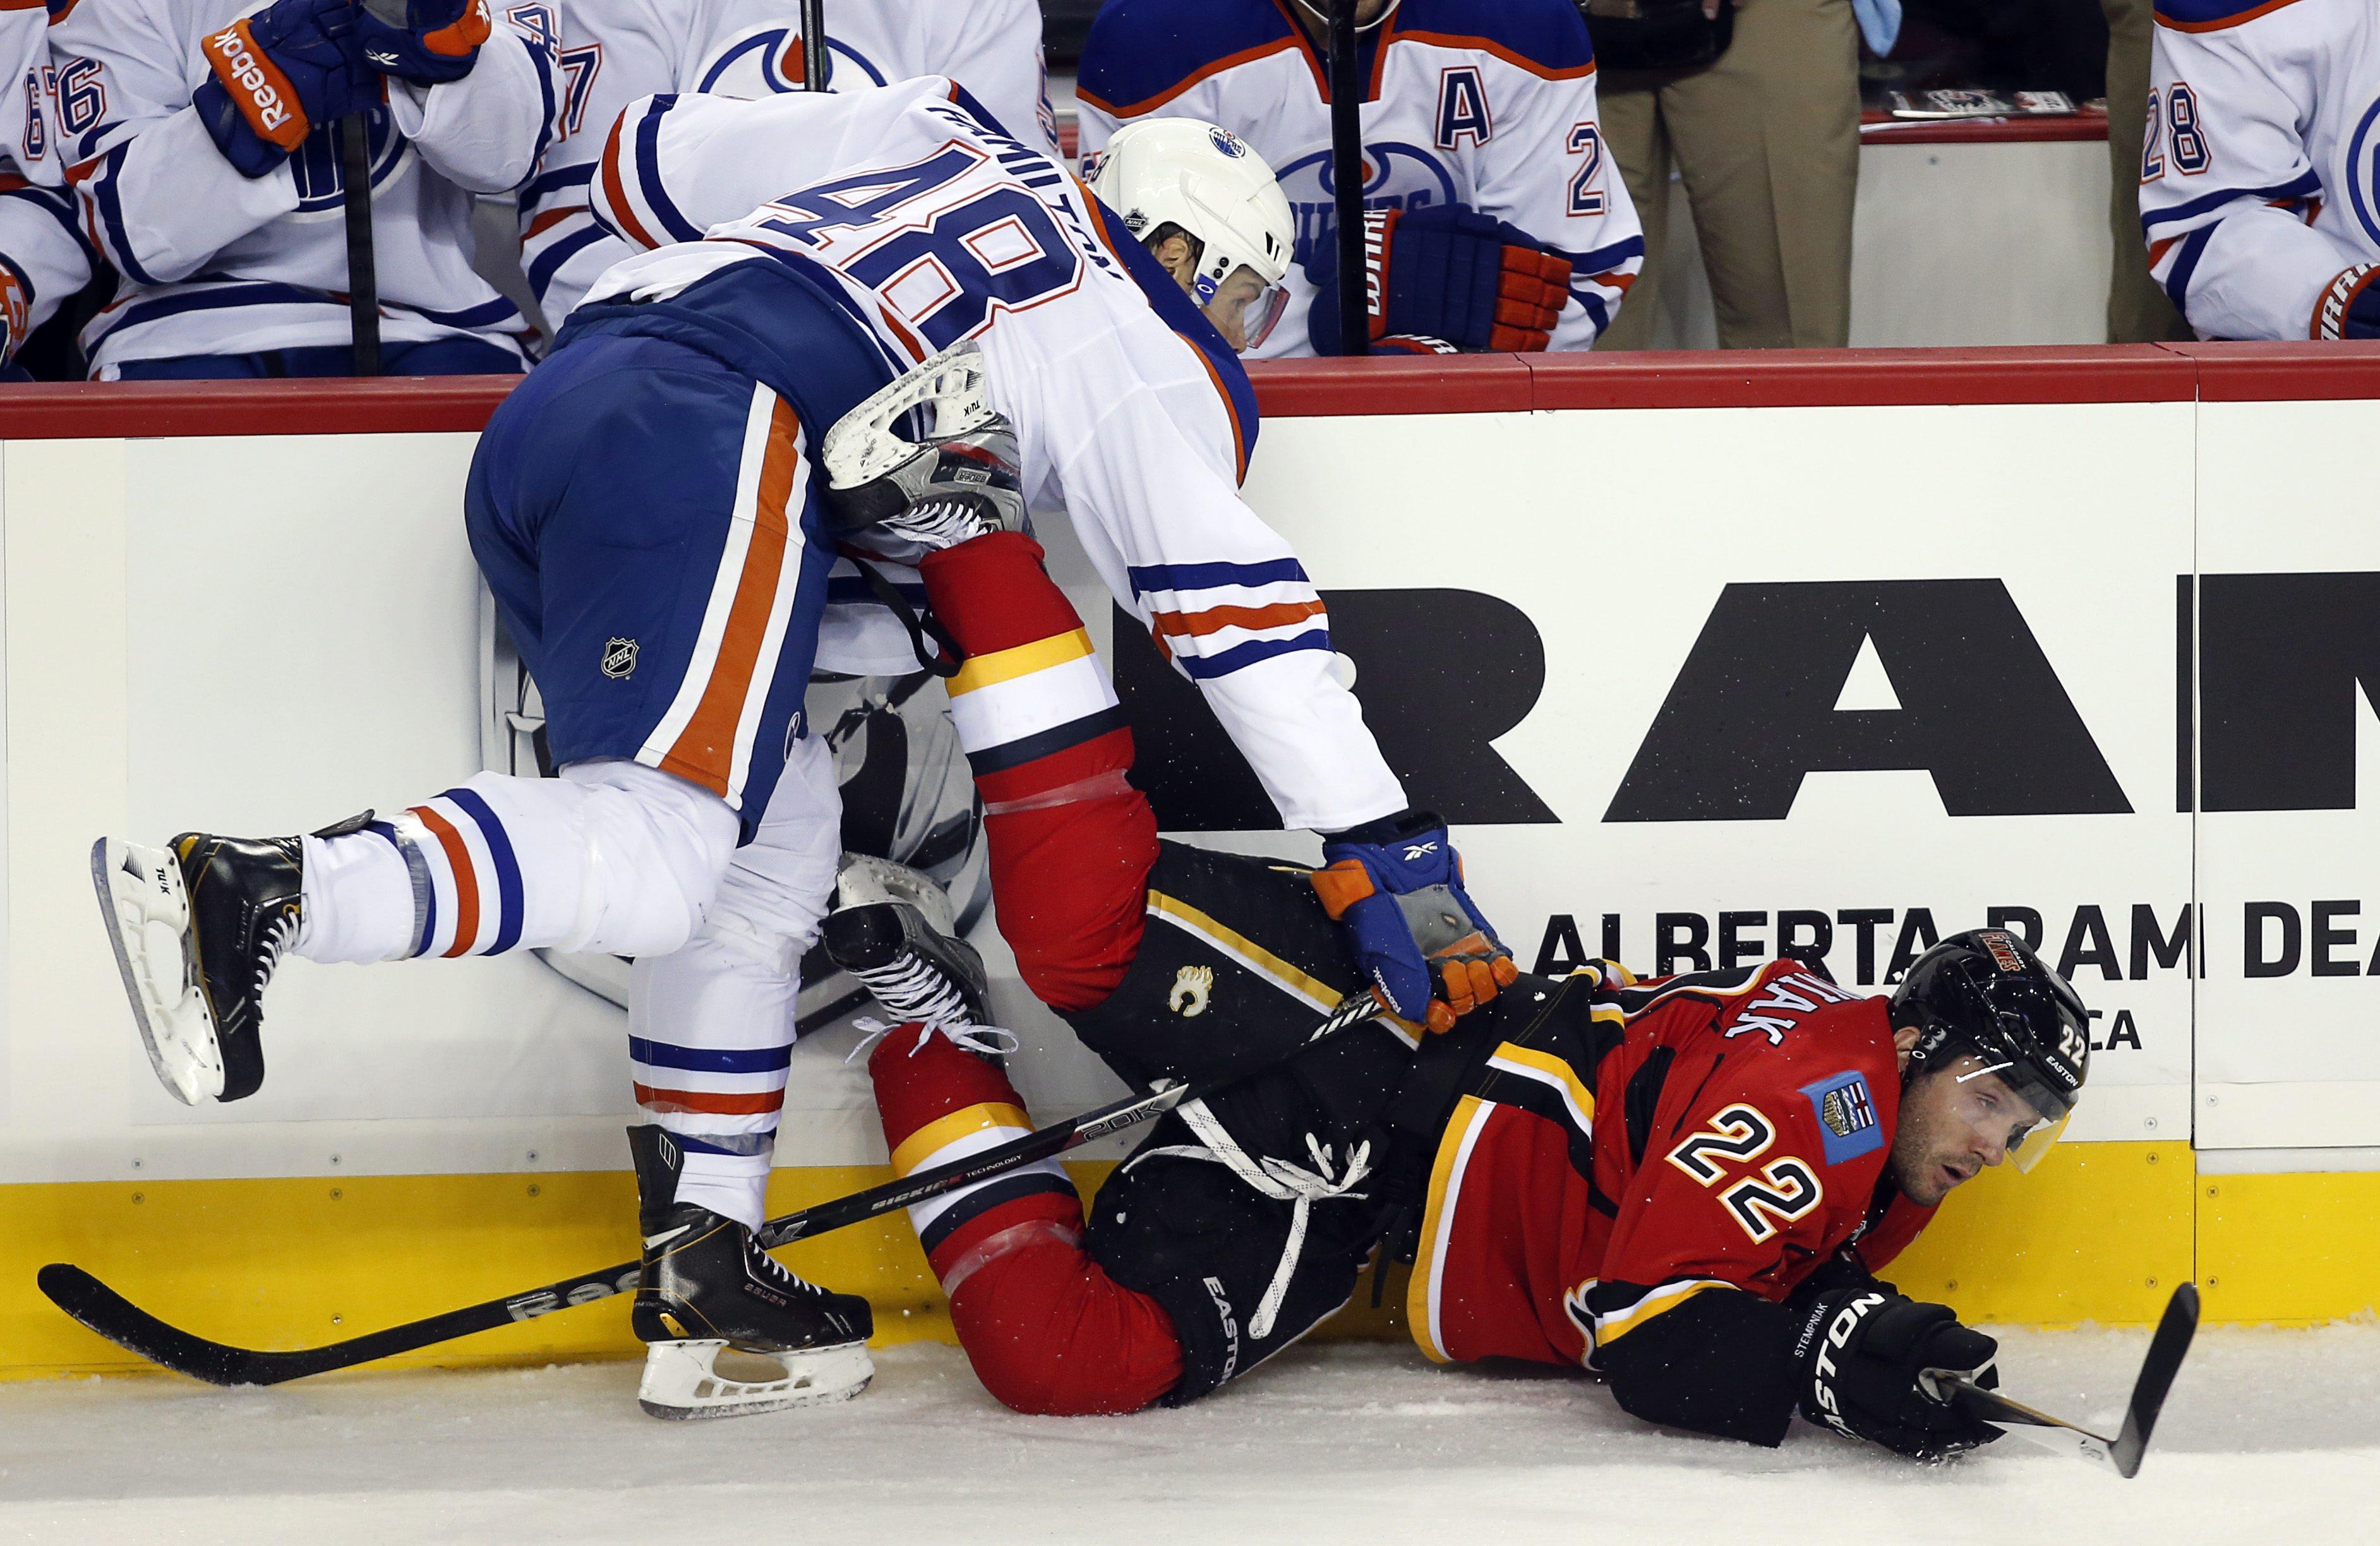 Marincin lifts Oilers past Flames